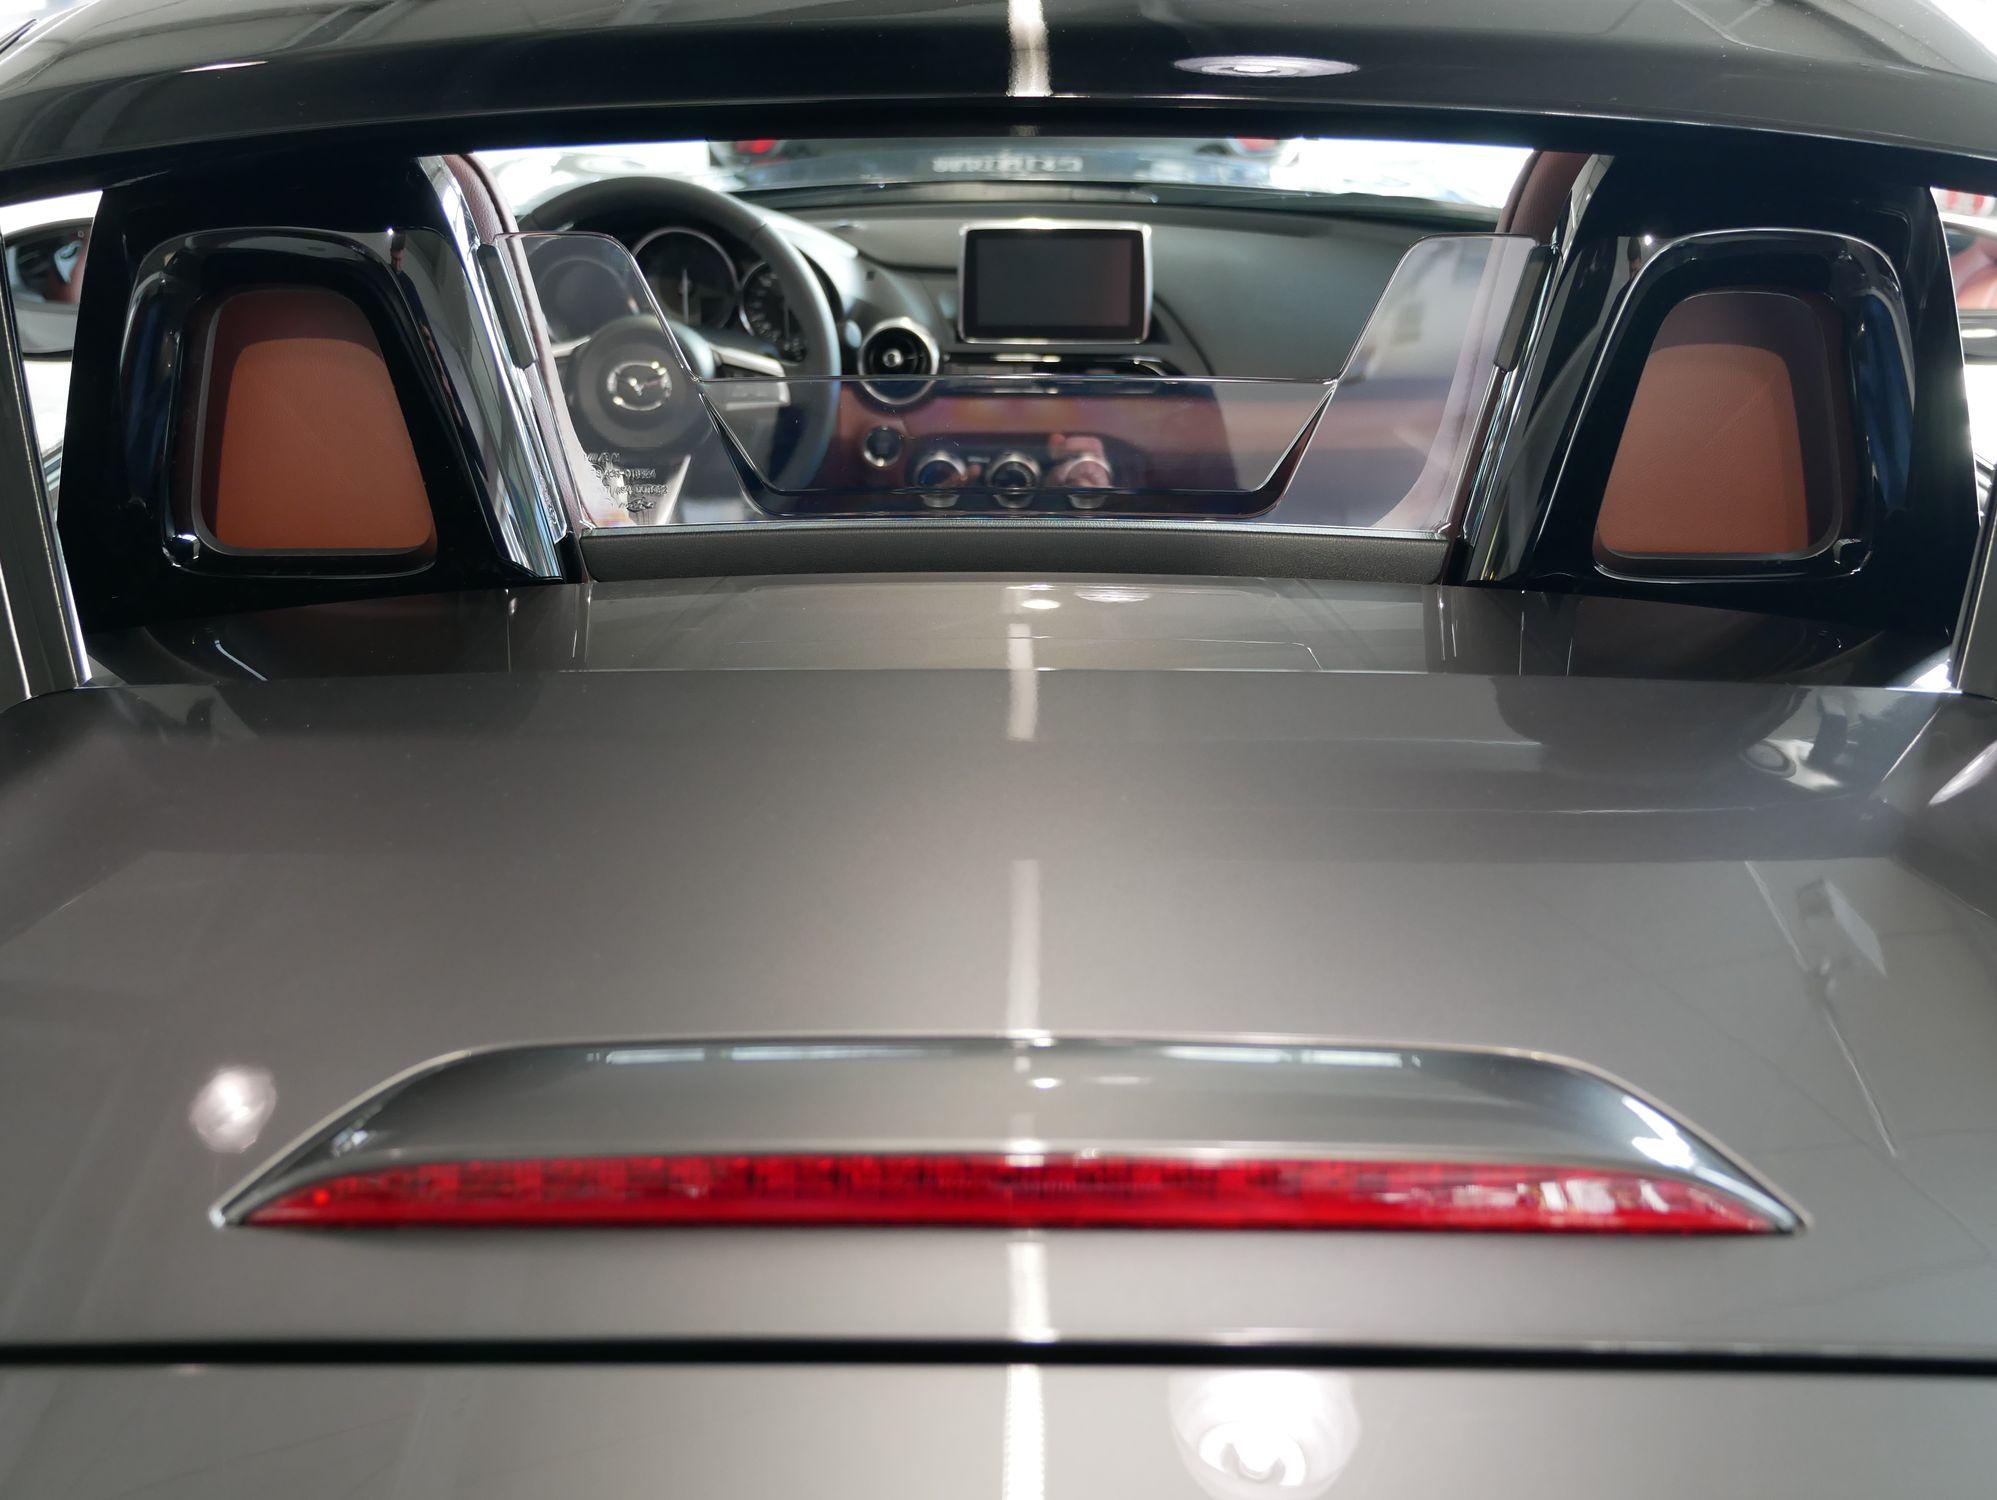 mazda mx-5 rf 2019 kaufen münchen | auto till